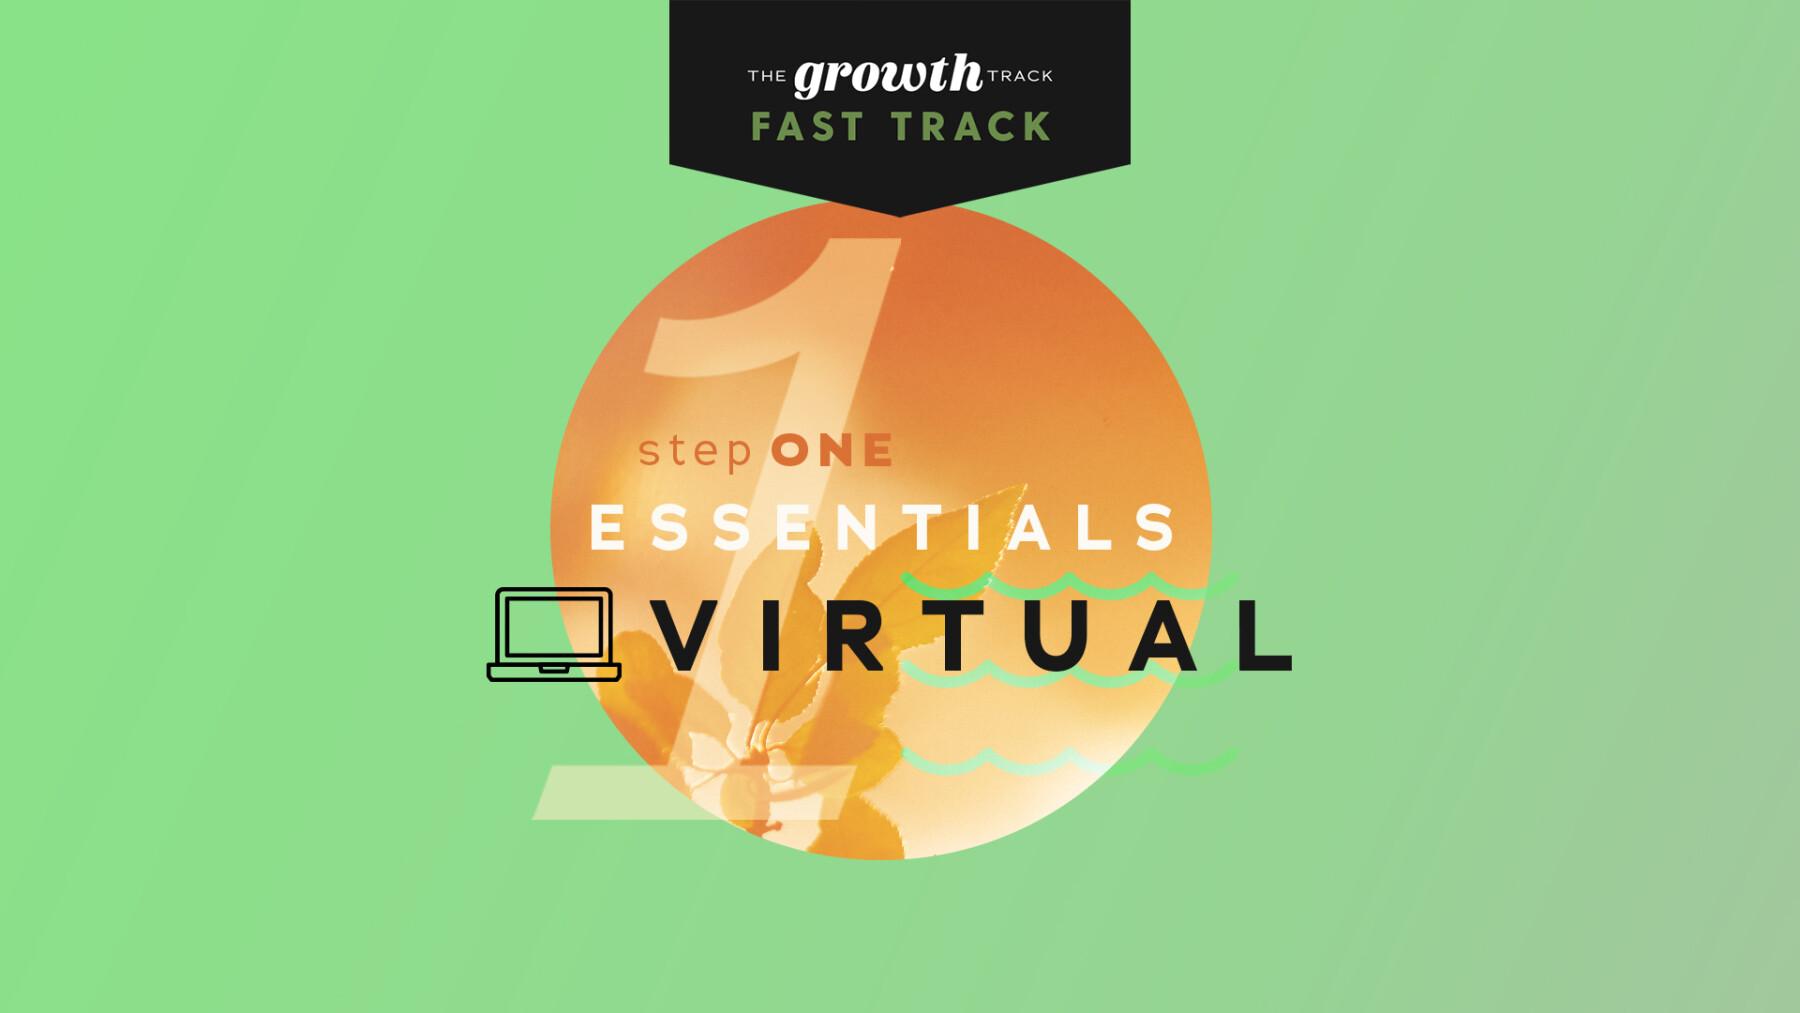 Virtual | Growth Track | Fast Track: Essentials